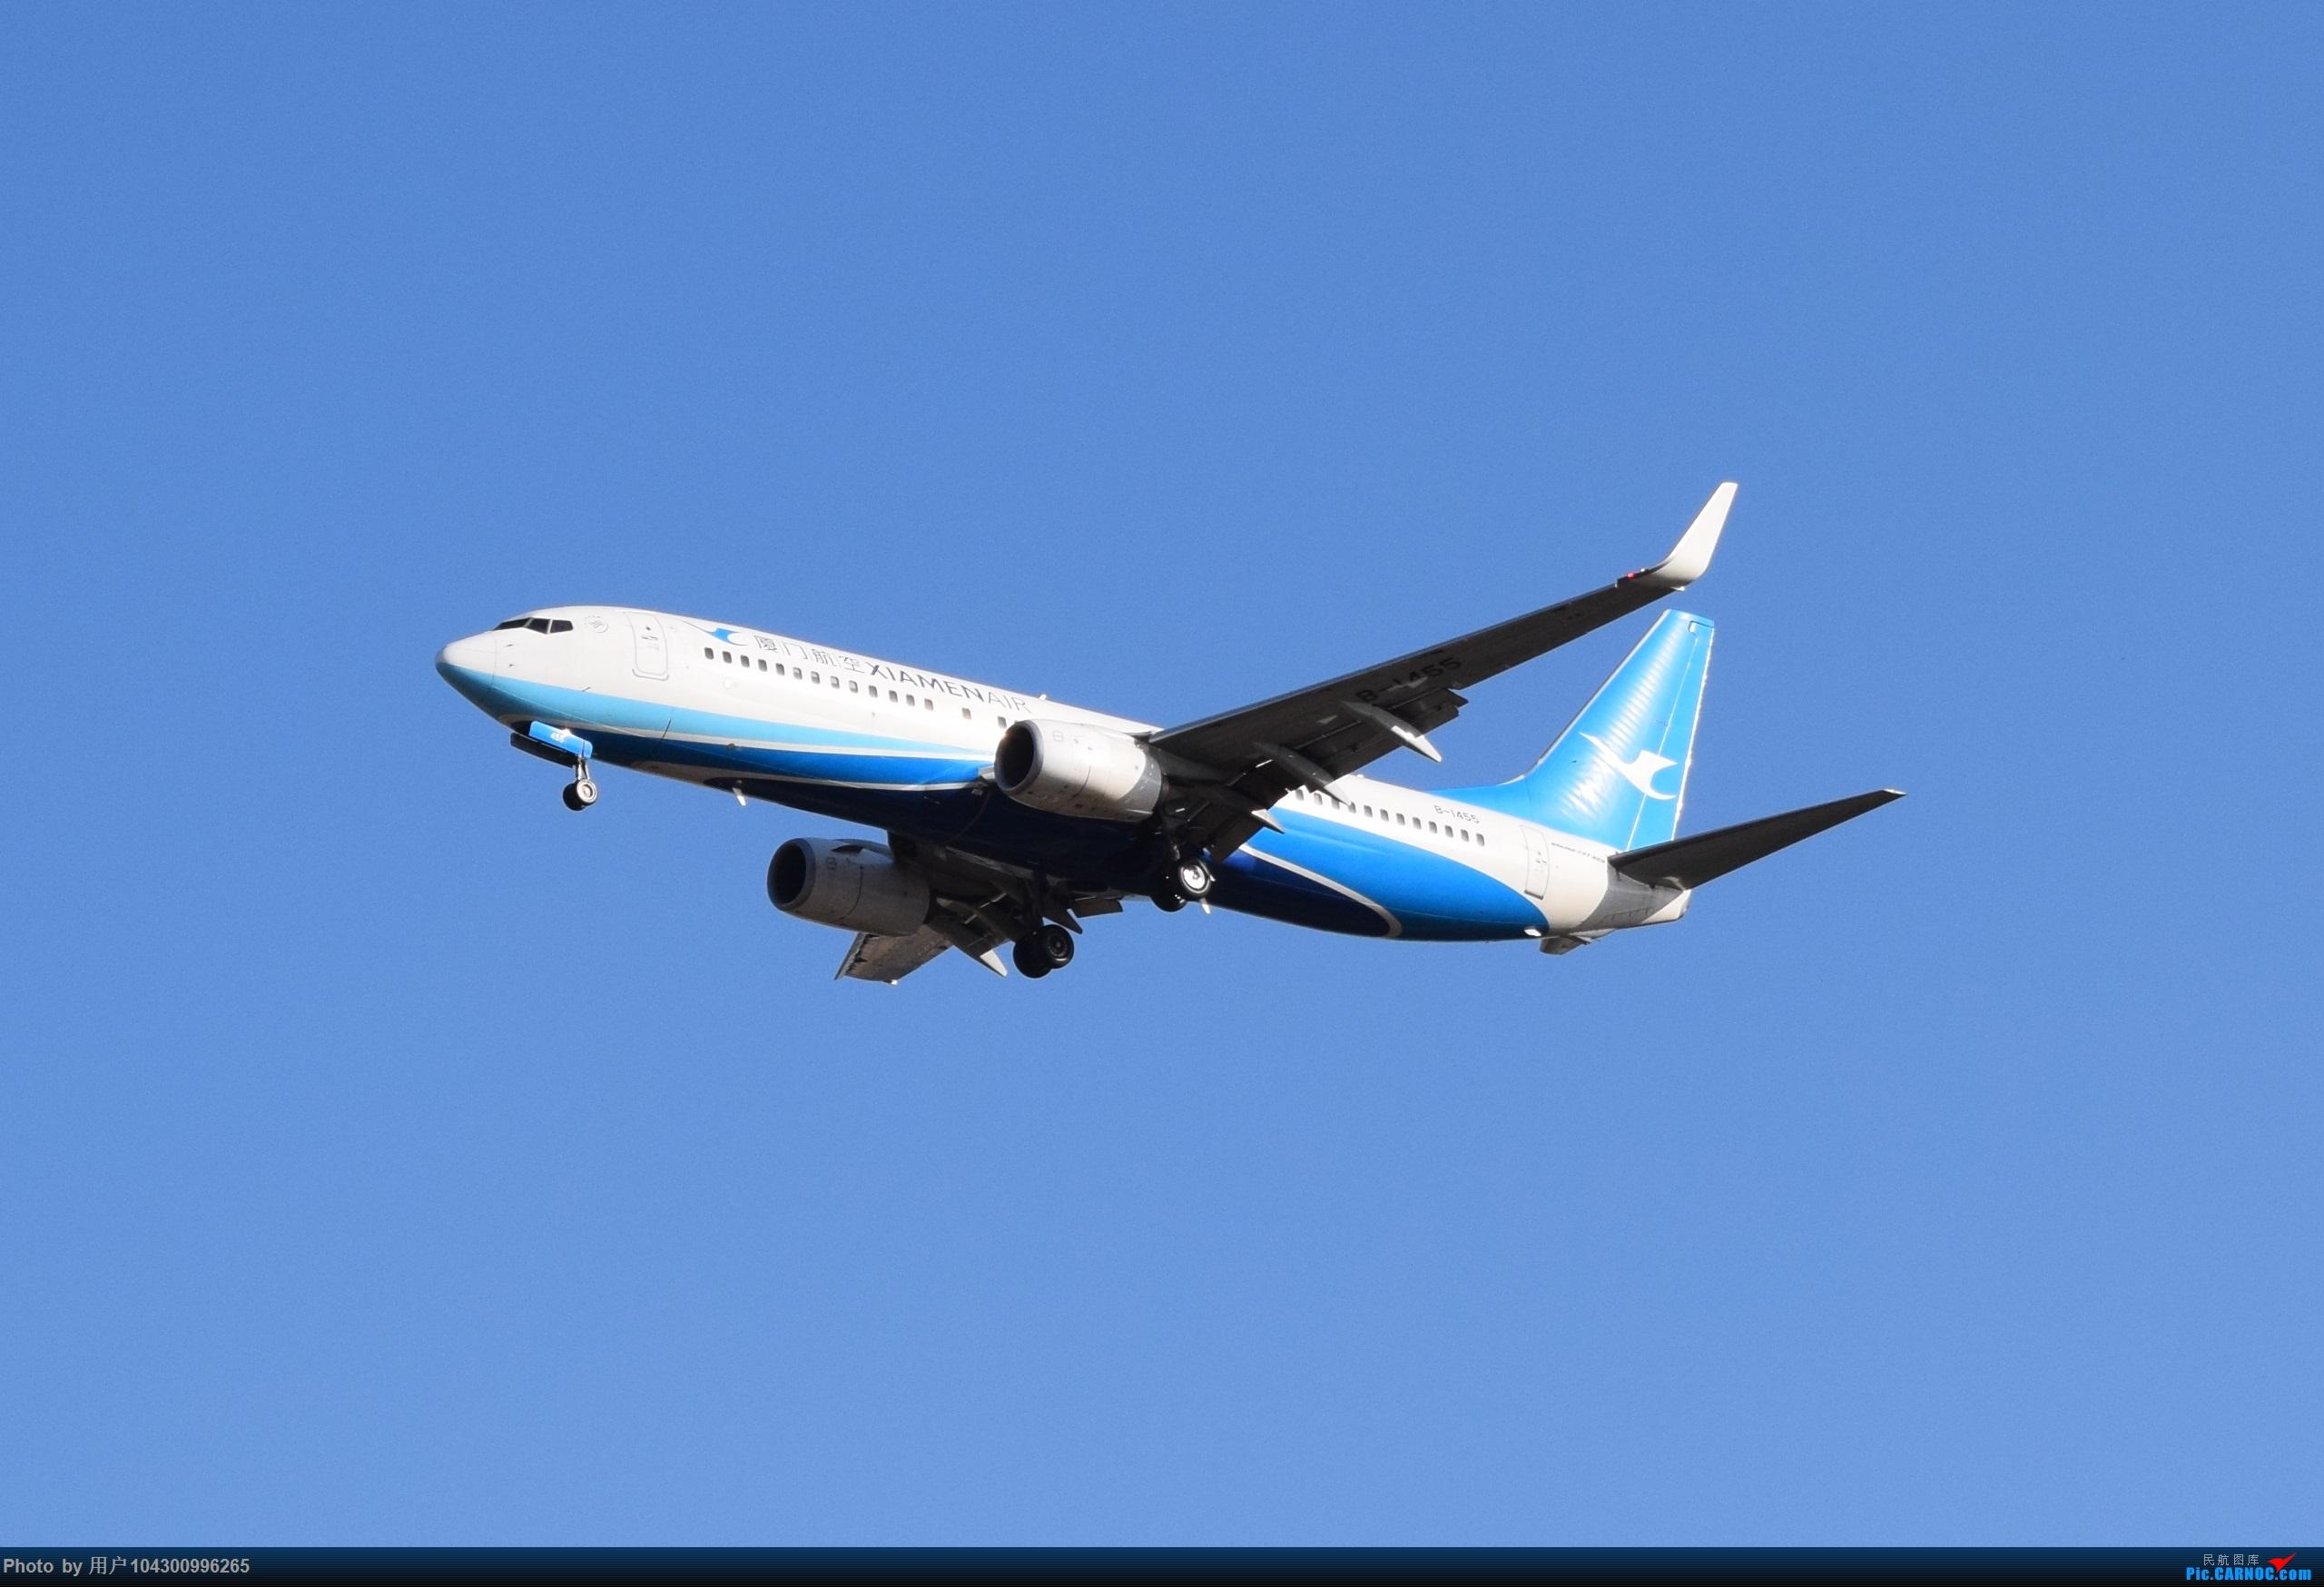 Re:[原创][KWE]贵阳今天天气不错,随便拍几张! BOEING 737-800 B-1455 中国贵阳龙洞堡国际机场